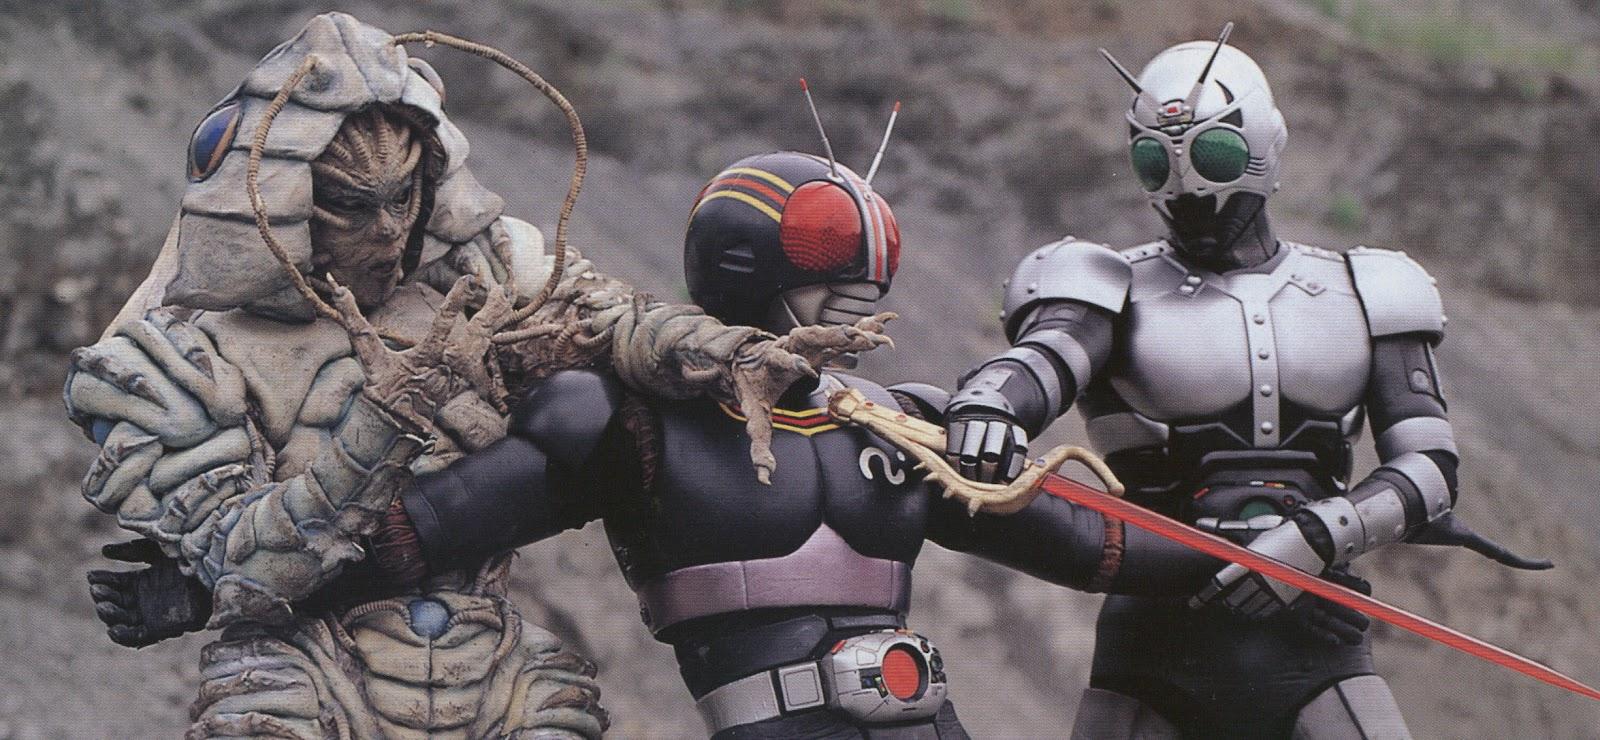 07.Kamen Rider Black